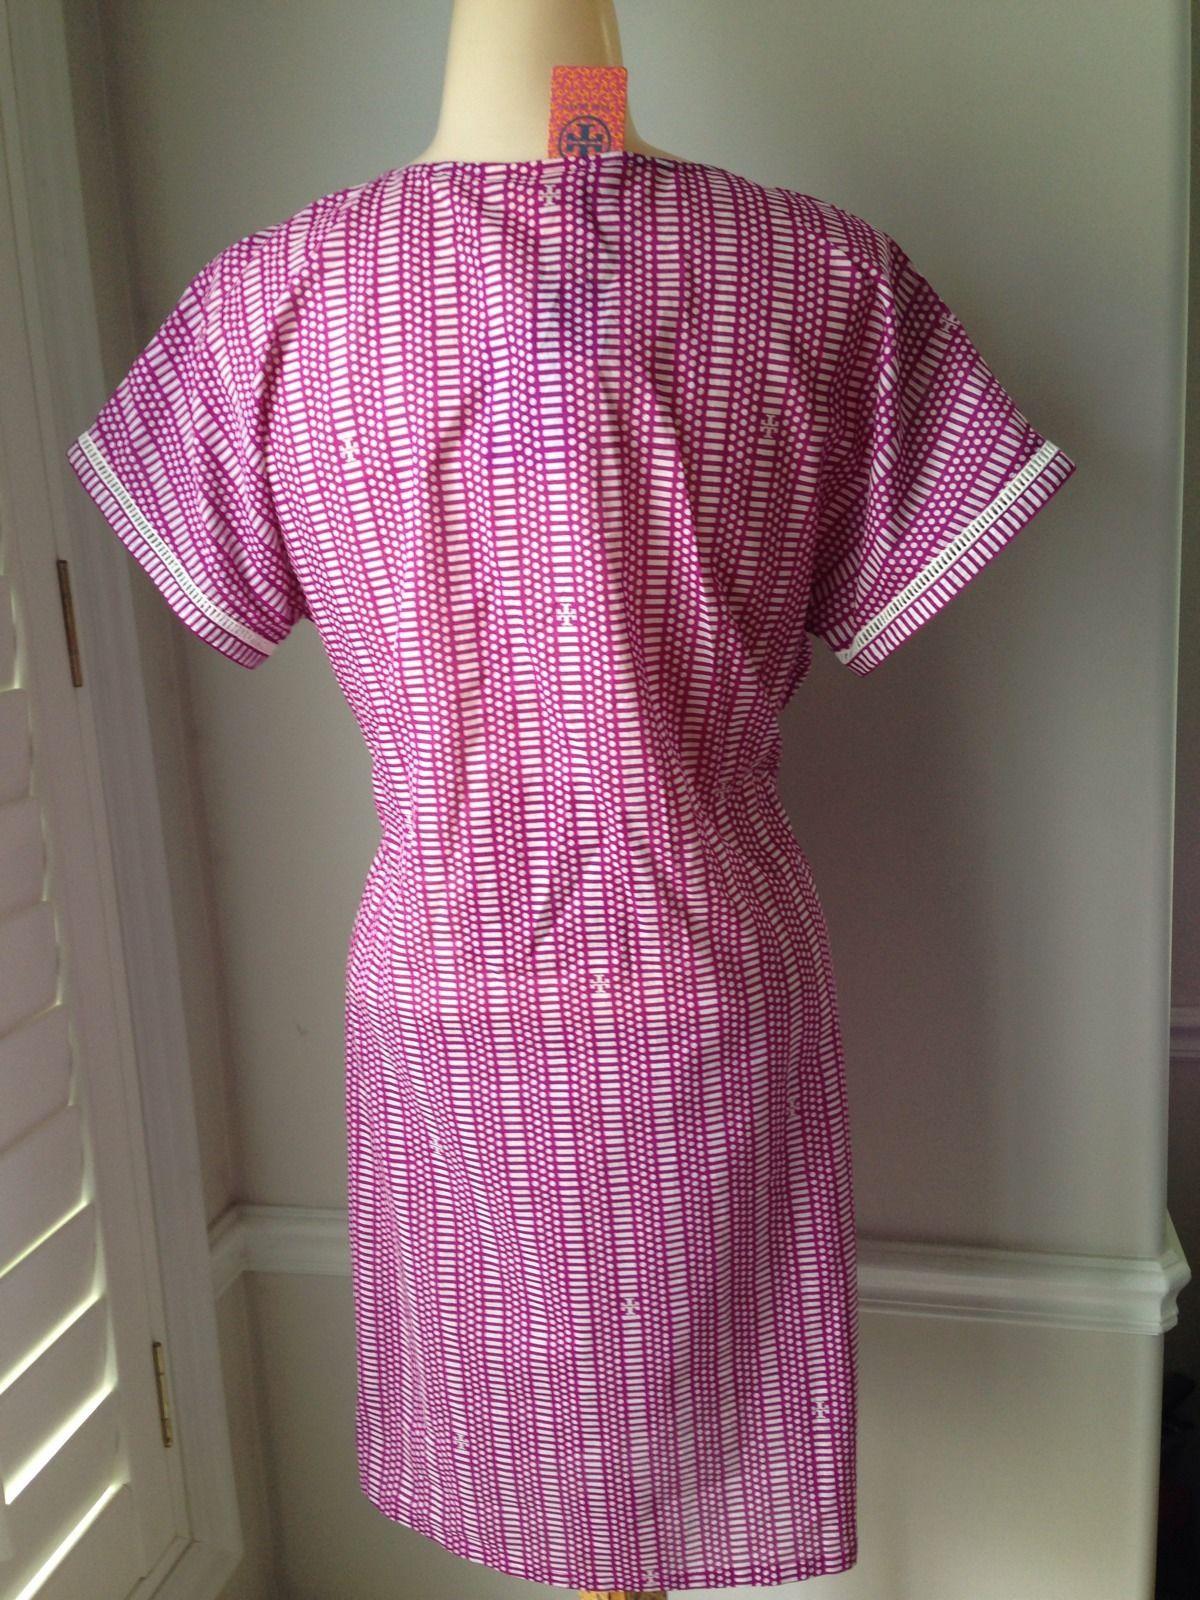 Tory Burch Cap Sleeve Tunic Dress - NWT SIZE SMALL